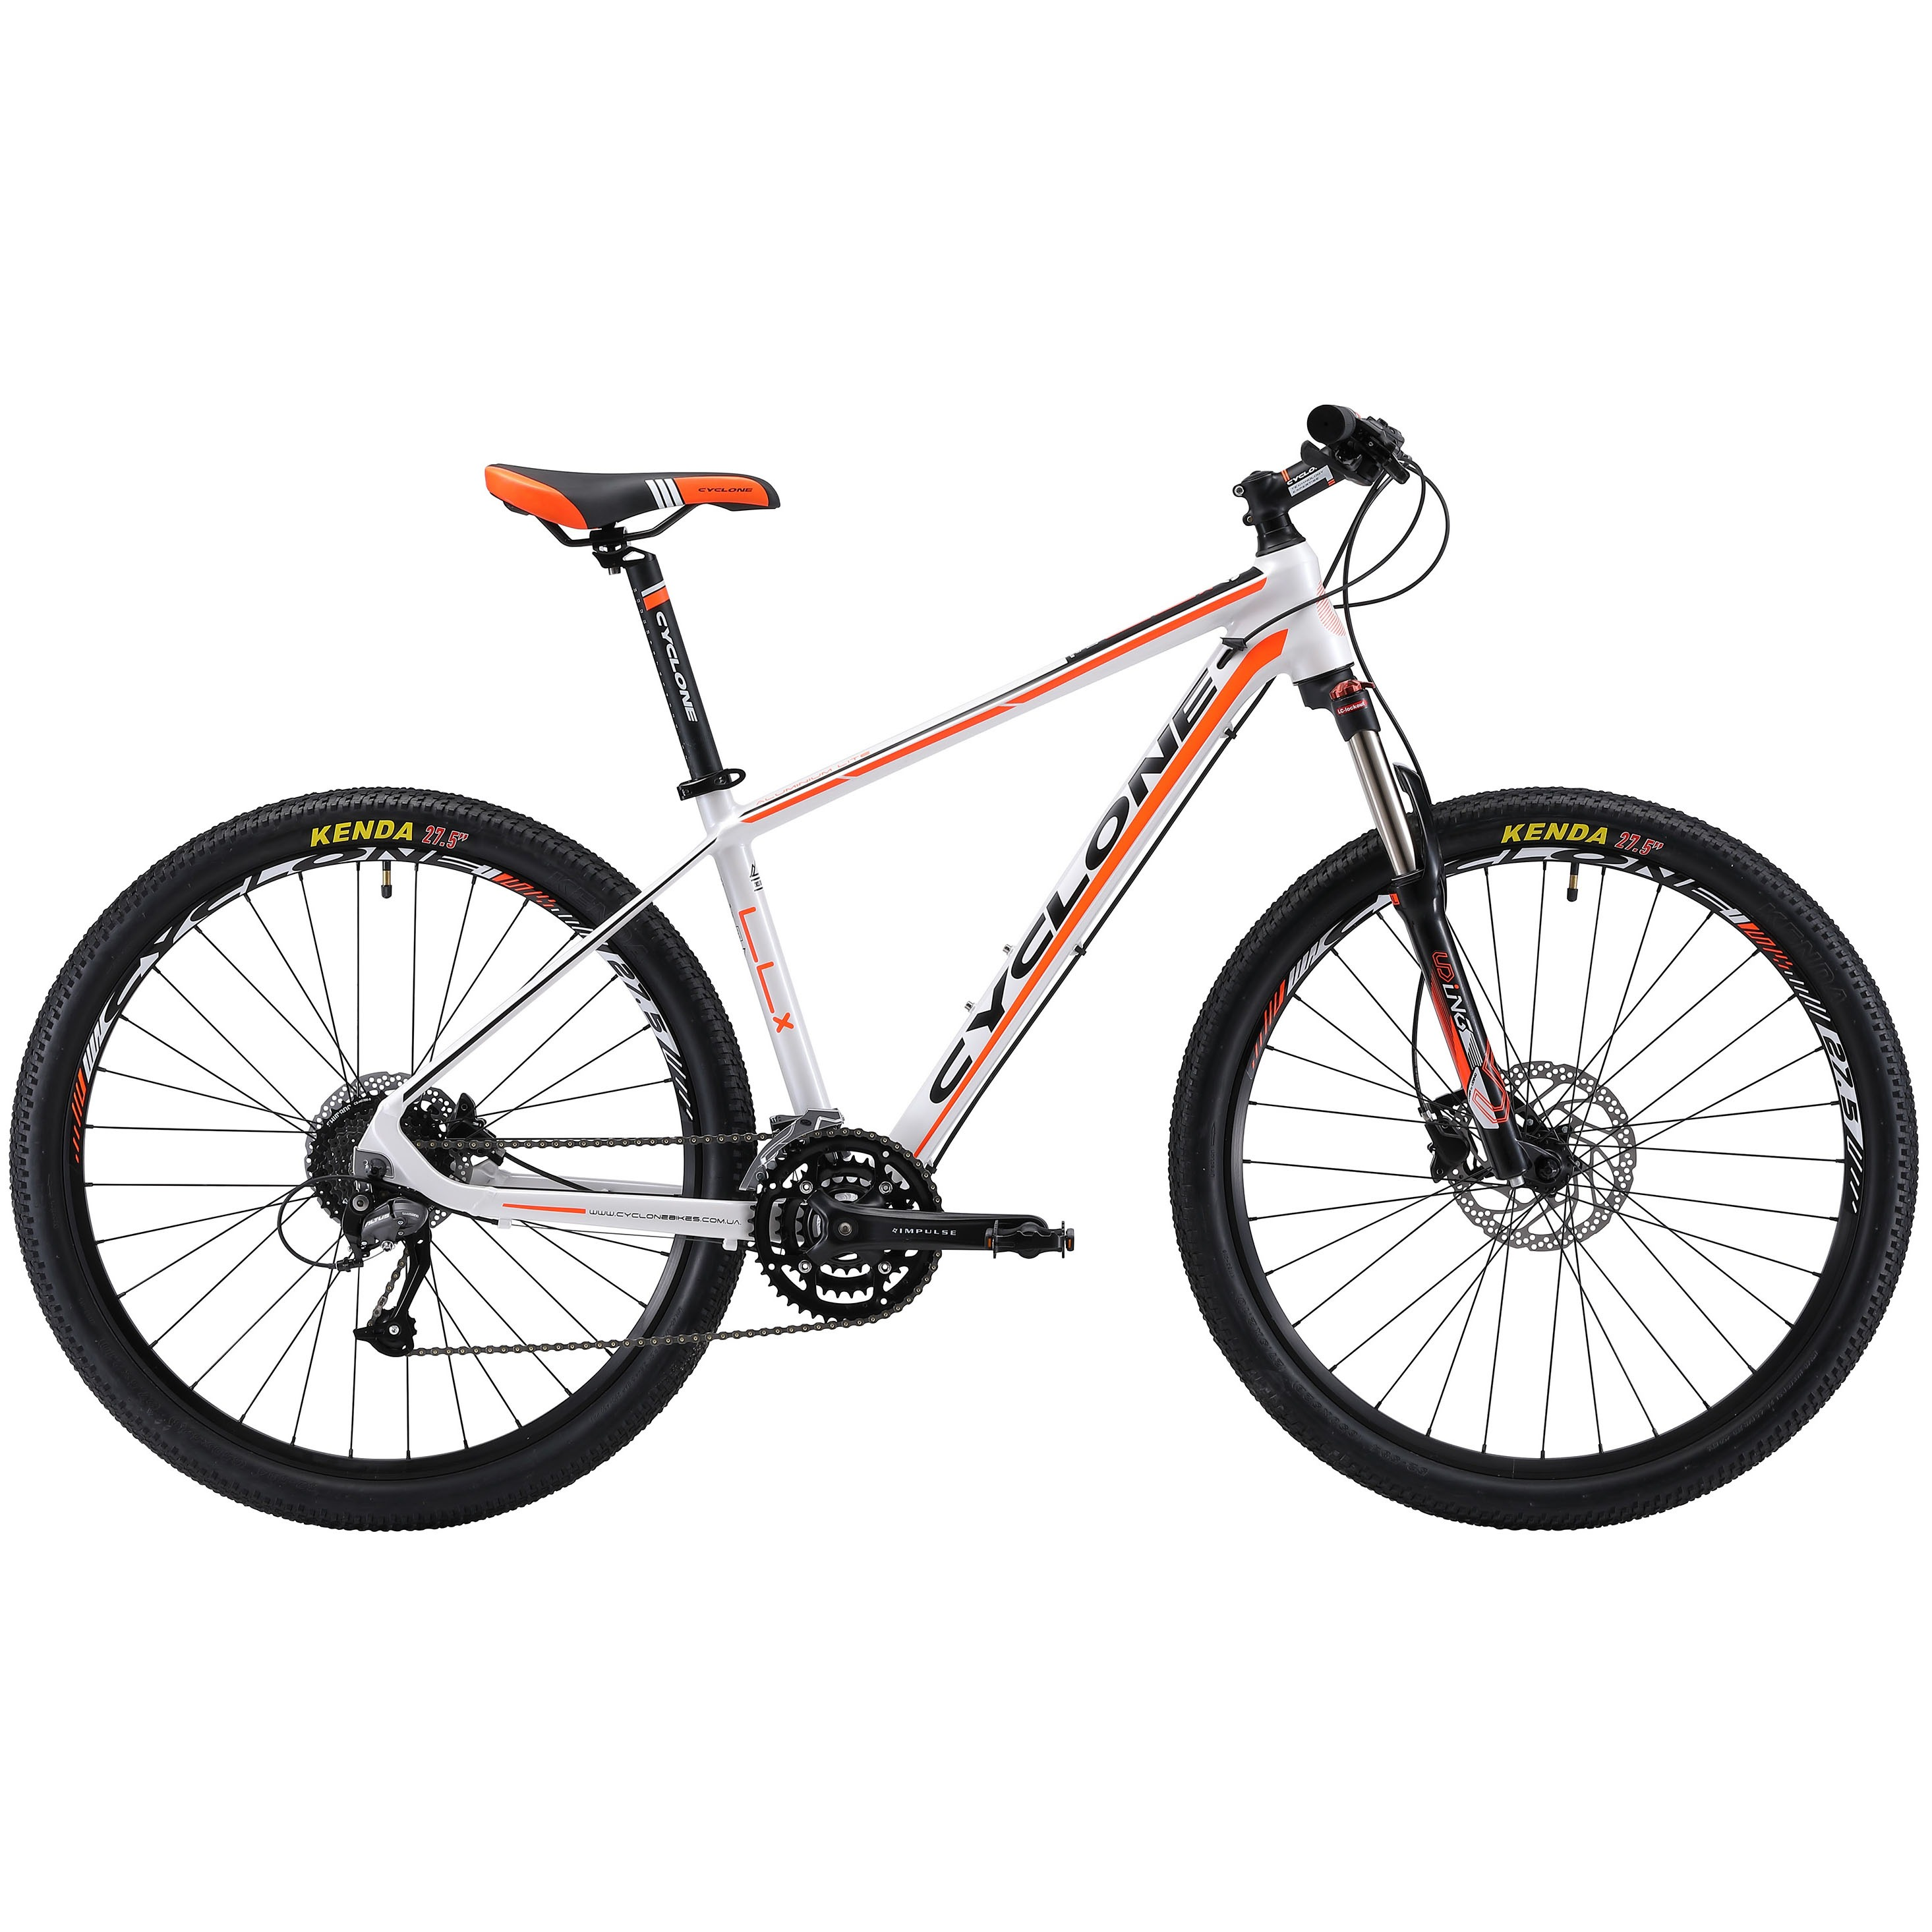 Фото Горный Велосипед Сyclone 27,5″ LLX-650b  17″ (бело-оранж-мат)